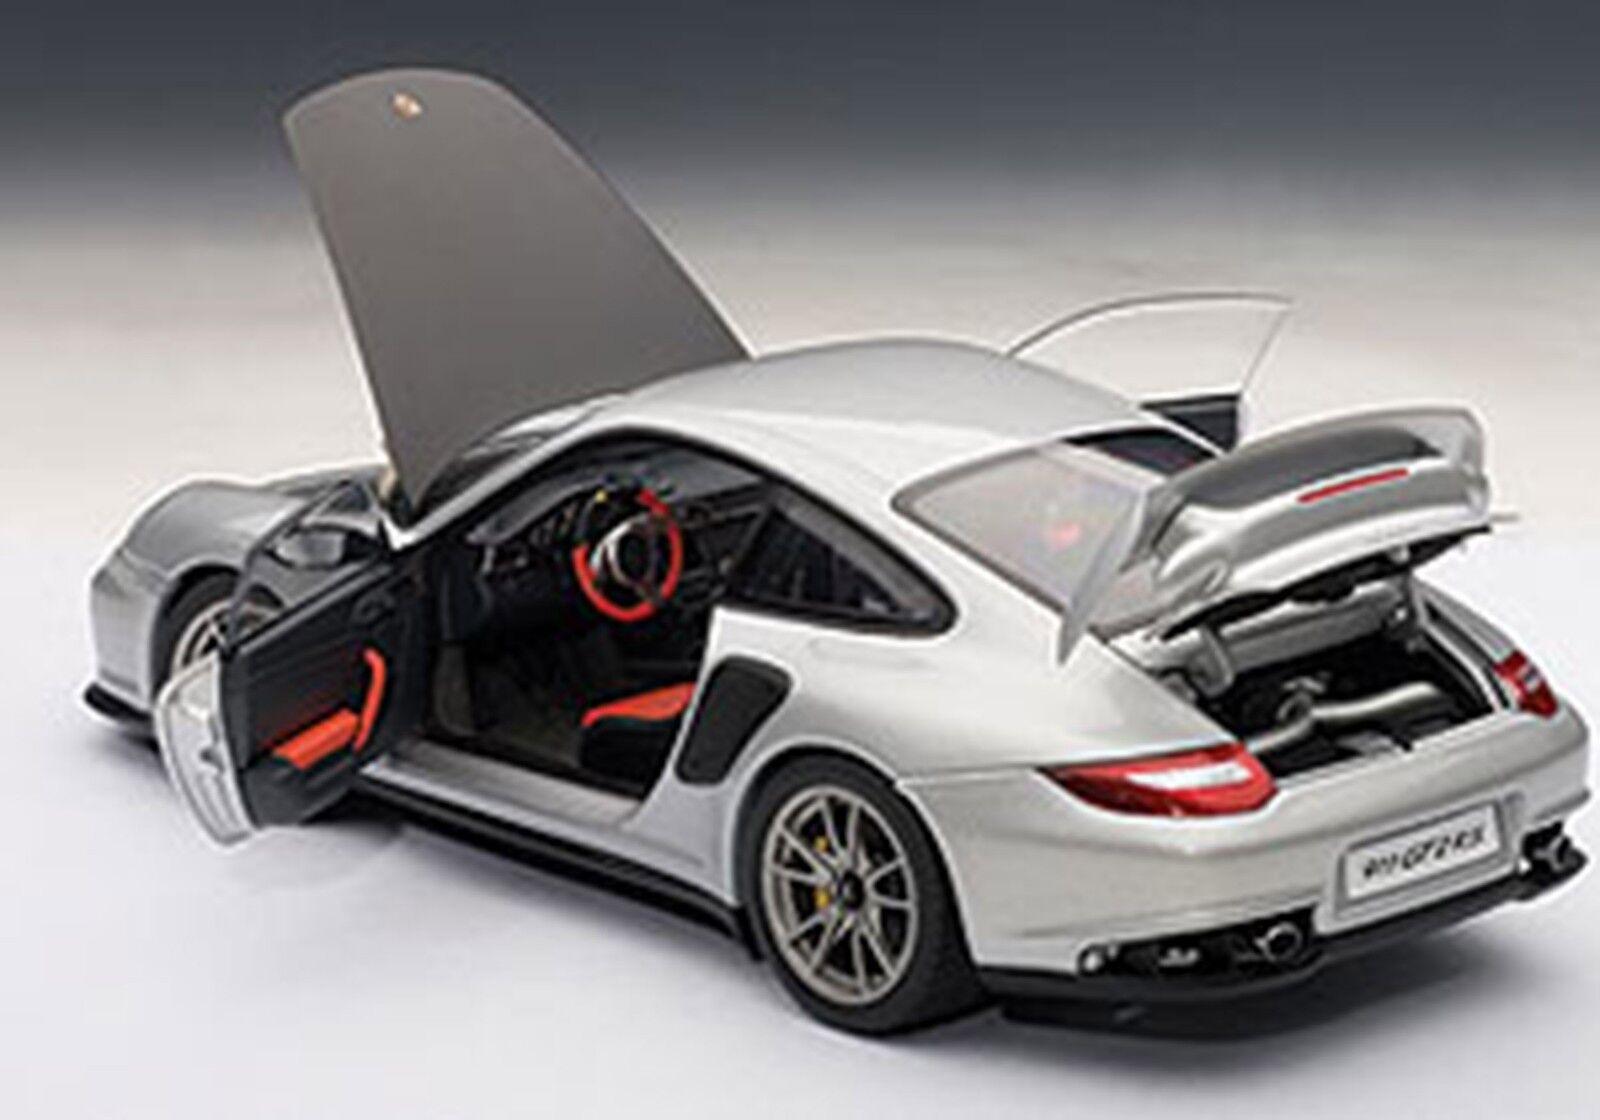 Autoart Porsche 911 997 GT2 Rs Plata 1 18 Escala Nueva Versión  en Stock